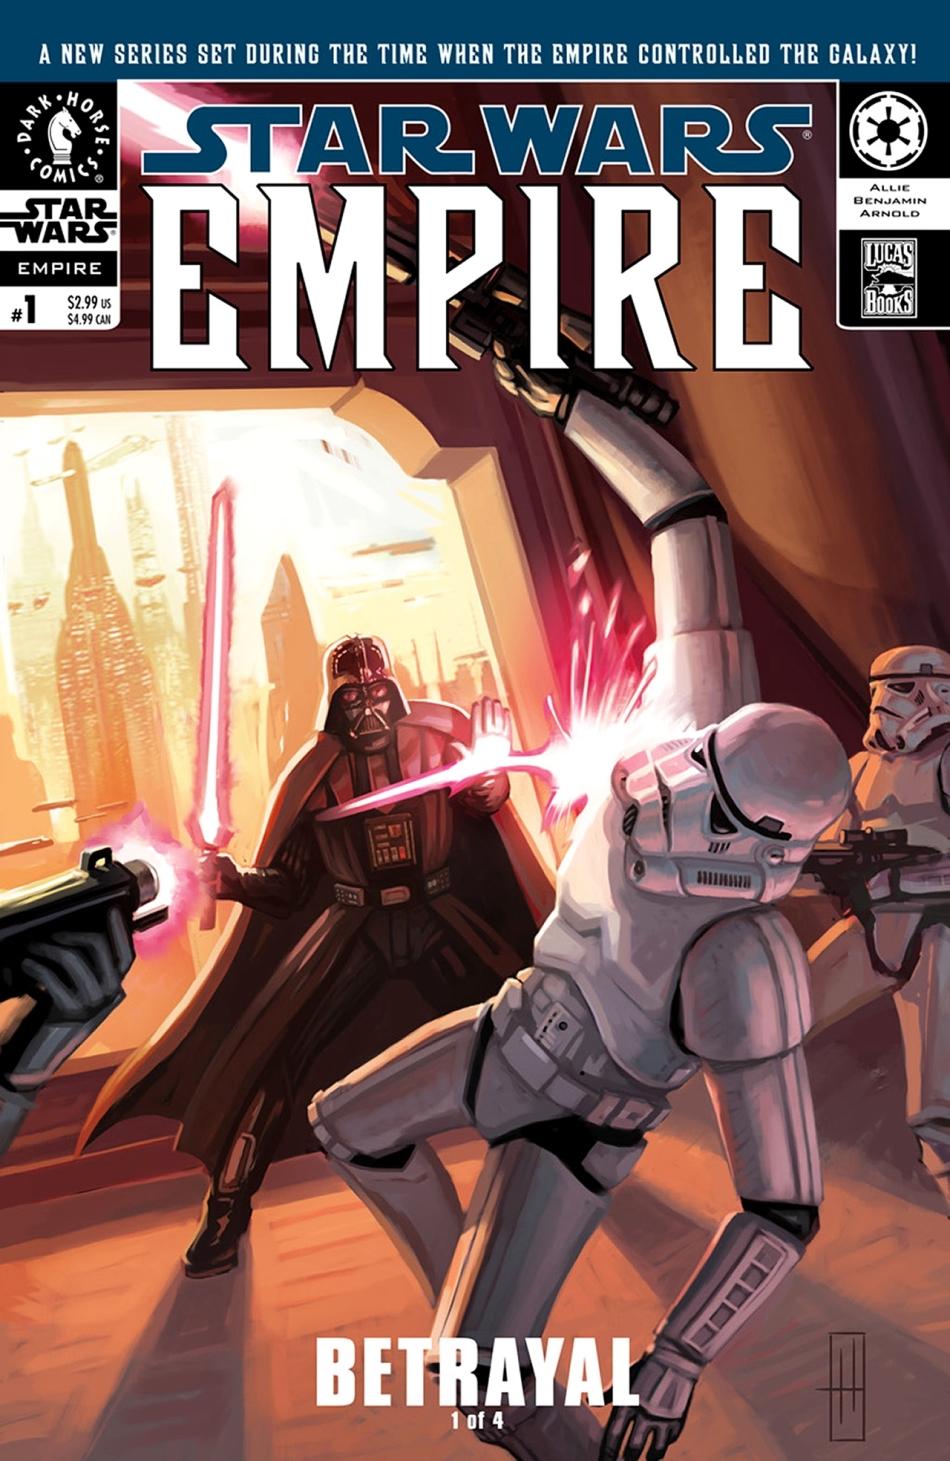 Empire #1: Betrayal, Part 1 (04.09.2002)